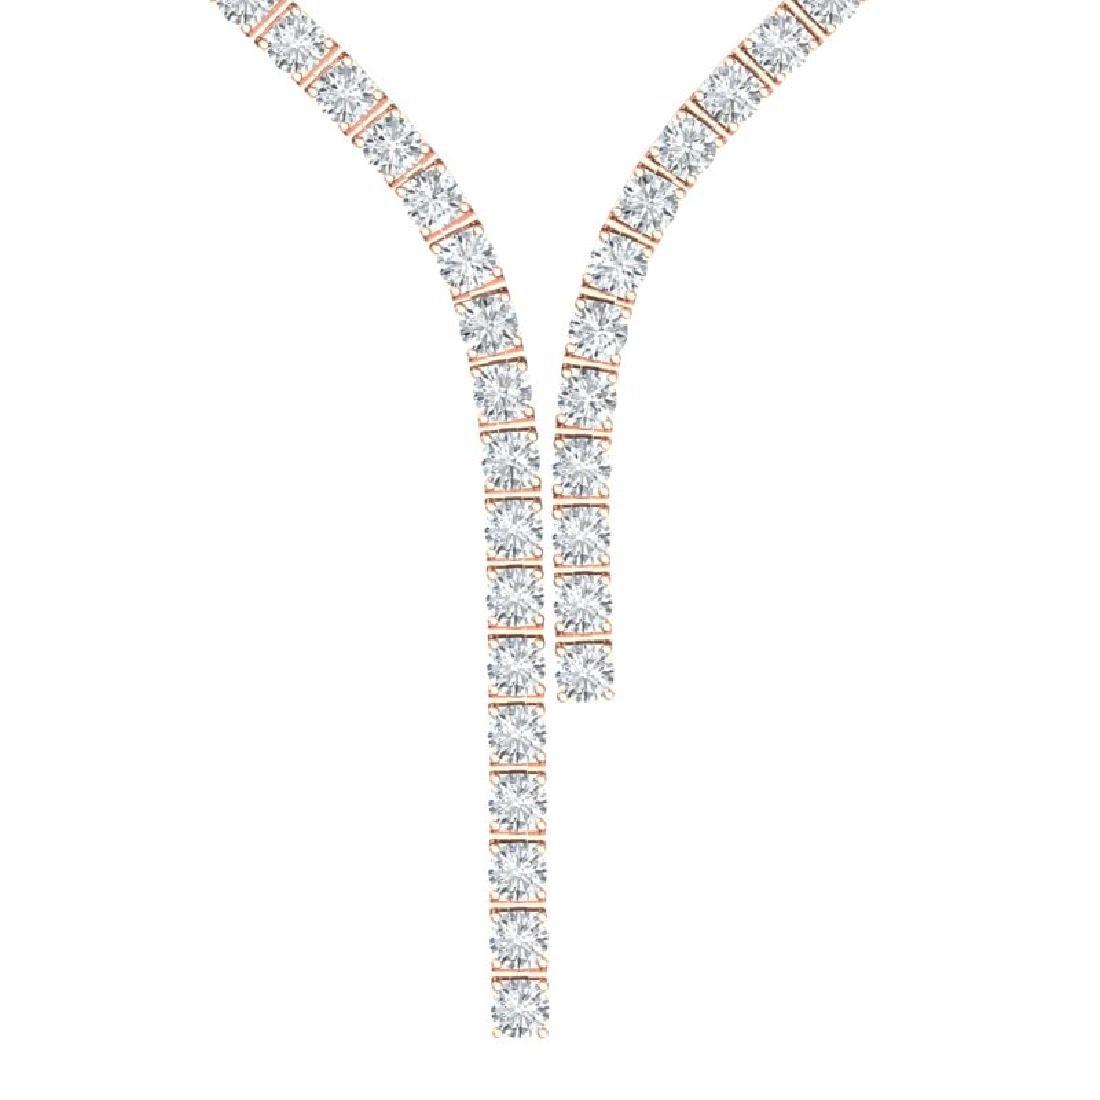 25 CTW Certified VS/SI Diamond Necklace 18K Rose Gold